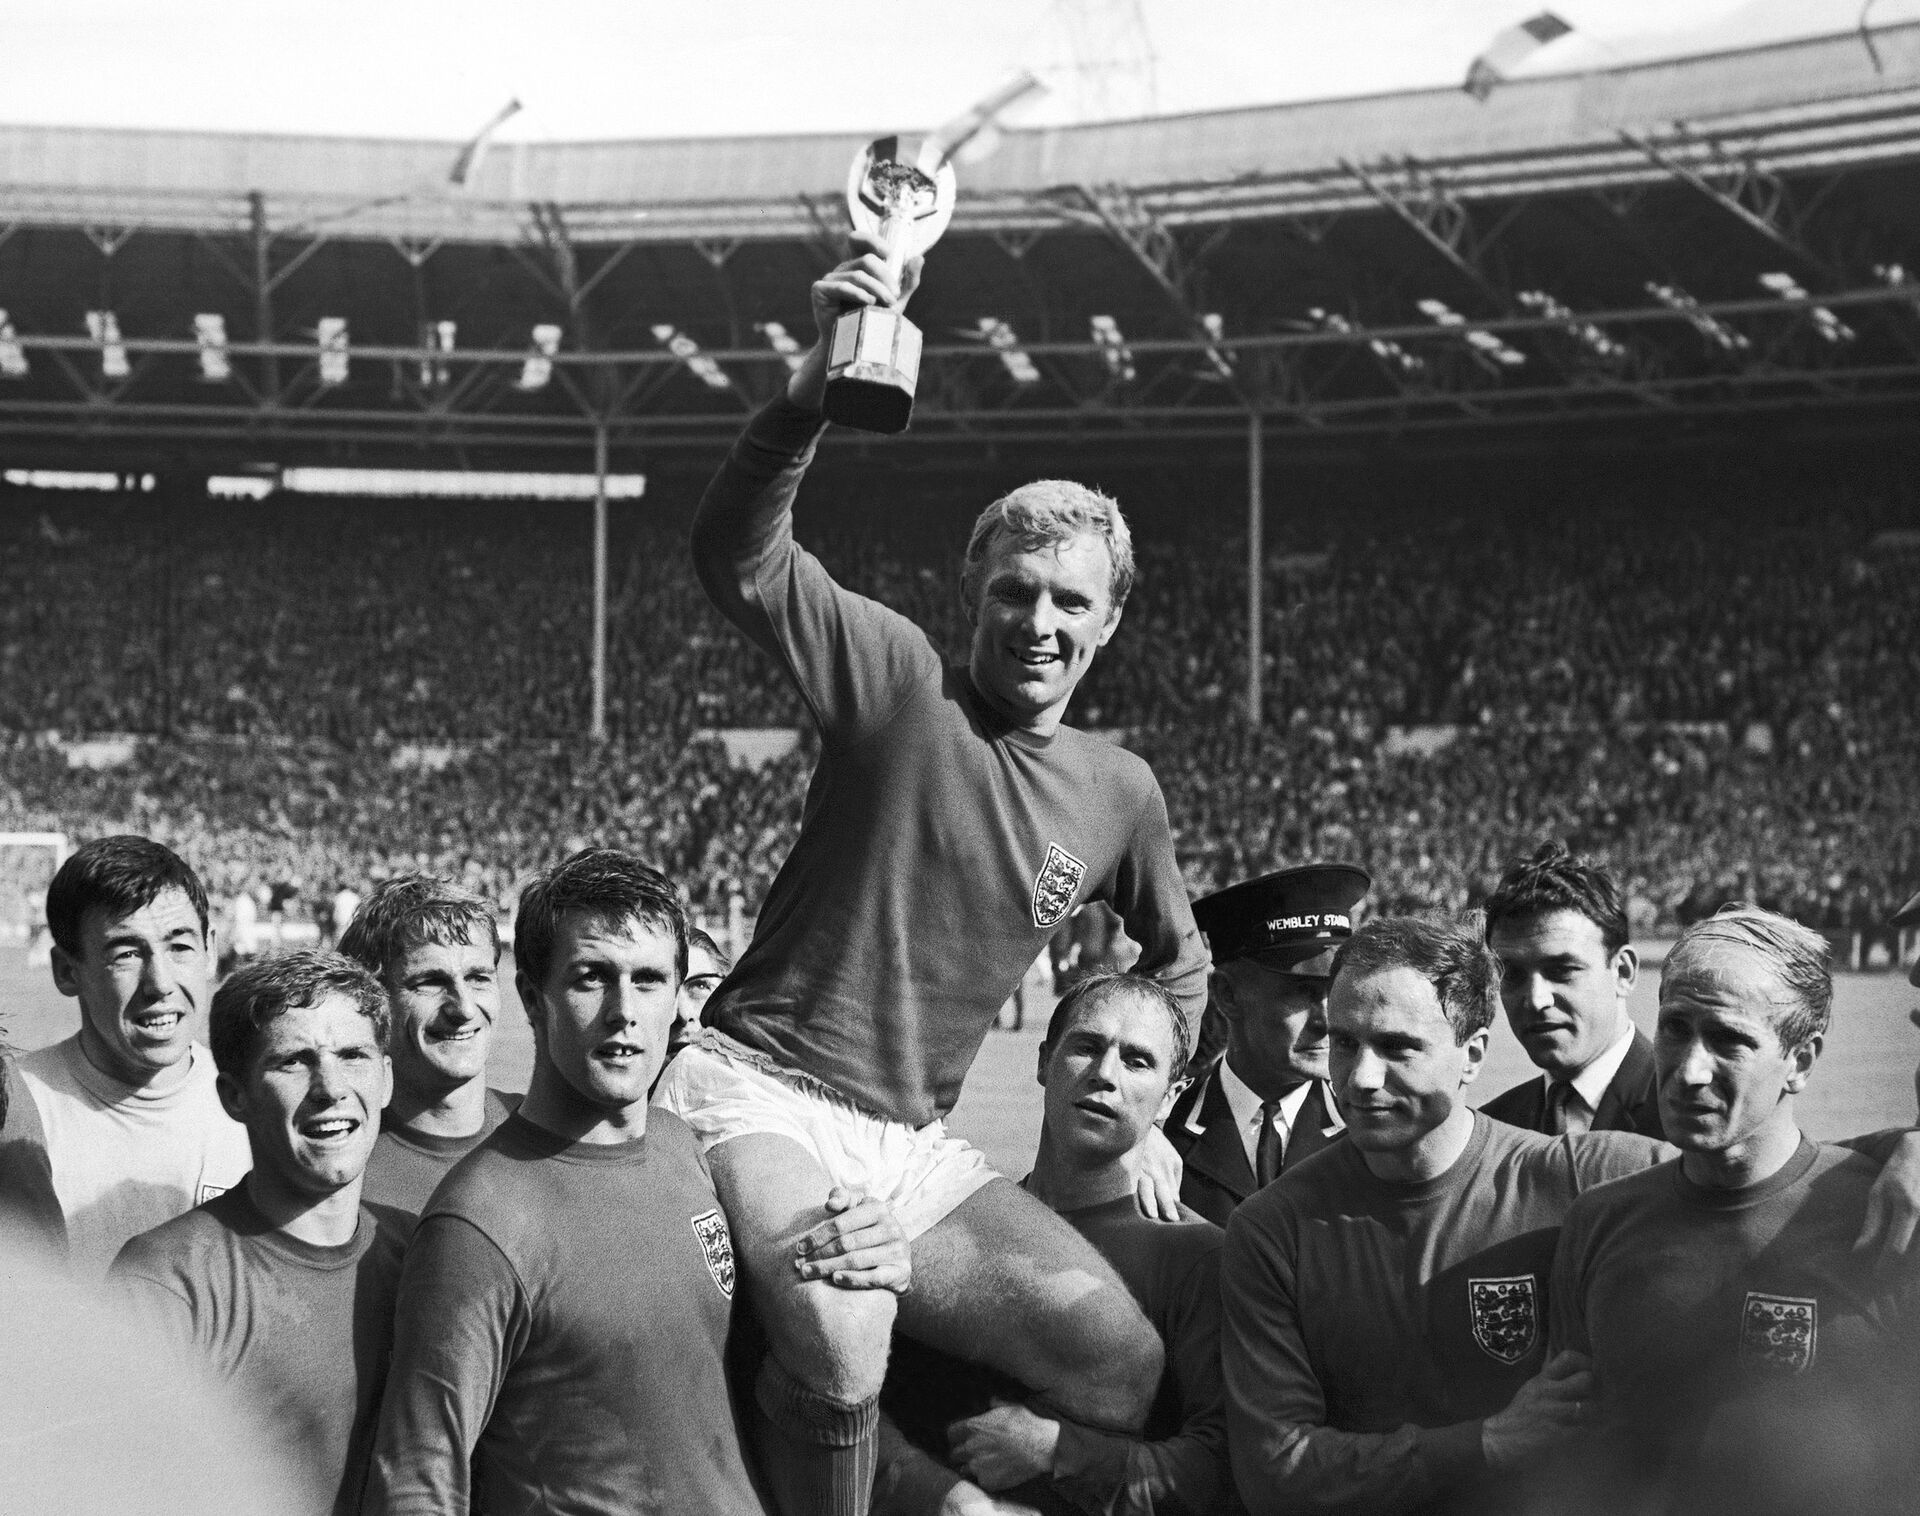 Футболисты сборной Англии, в центре капитан команды Бобби Мур, 1966 год - РИА Новости, 1920, 02.12.2020